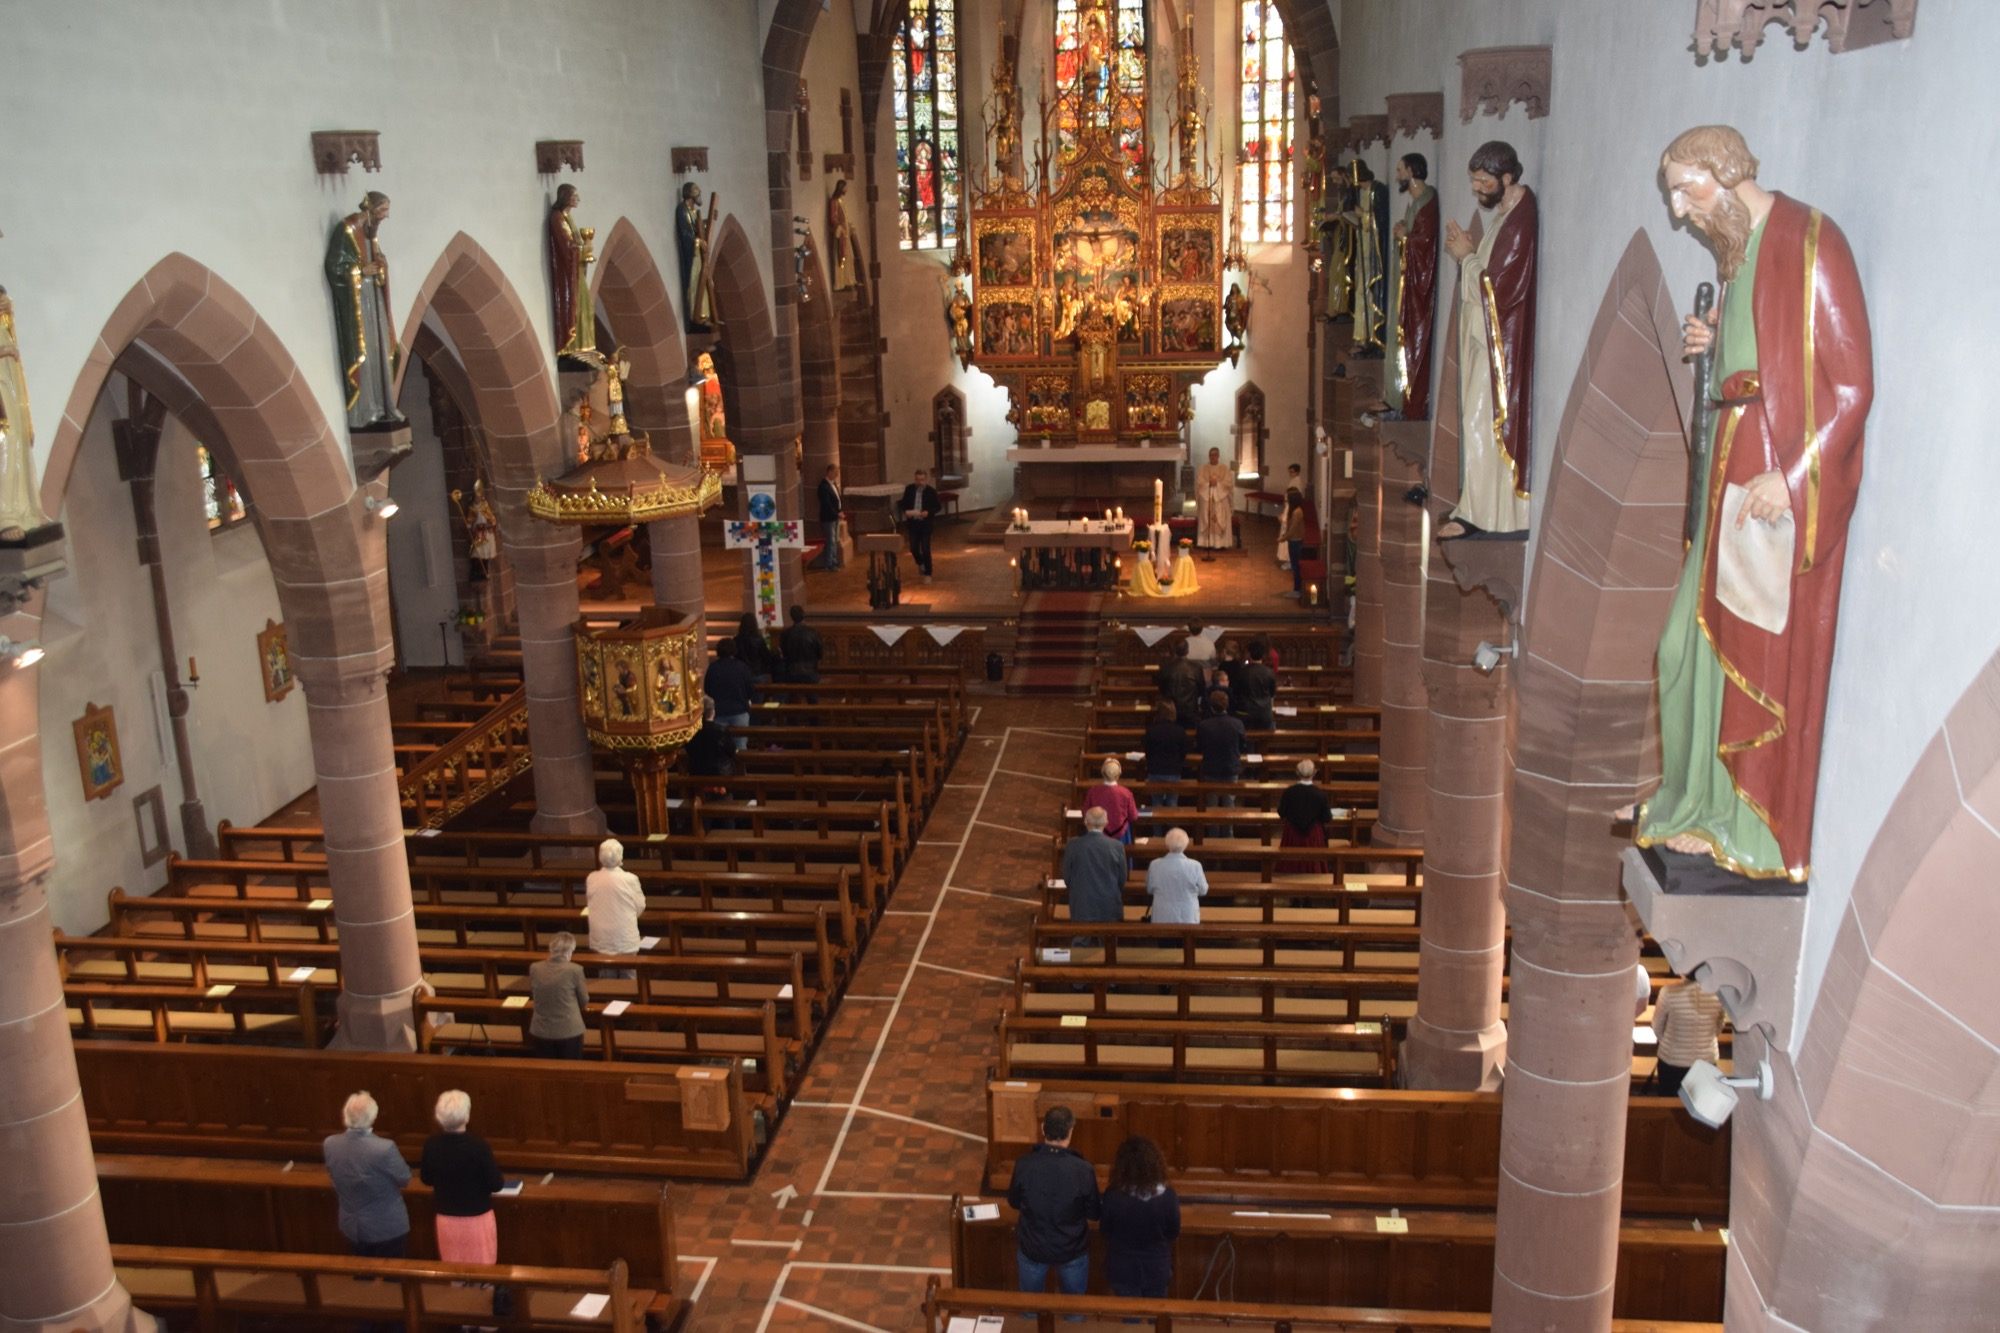 Corona Gottesdienst